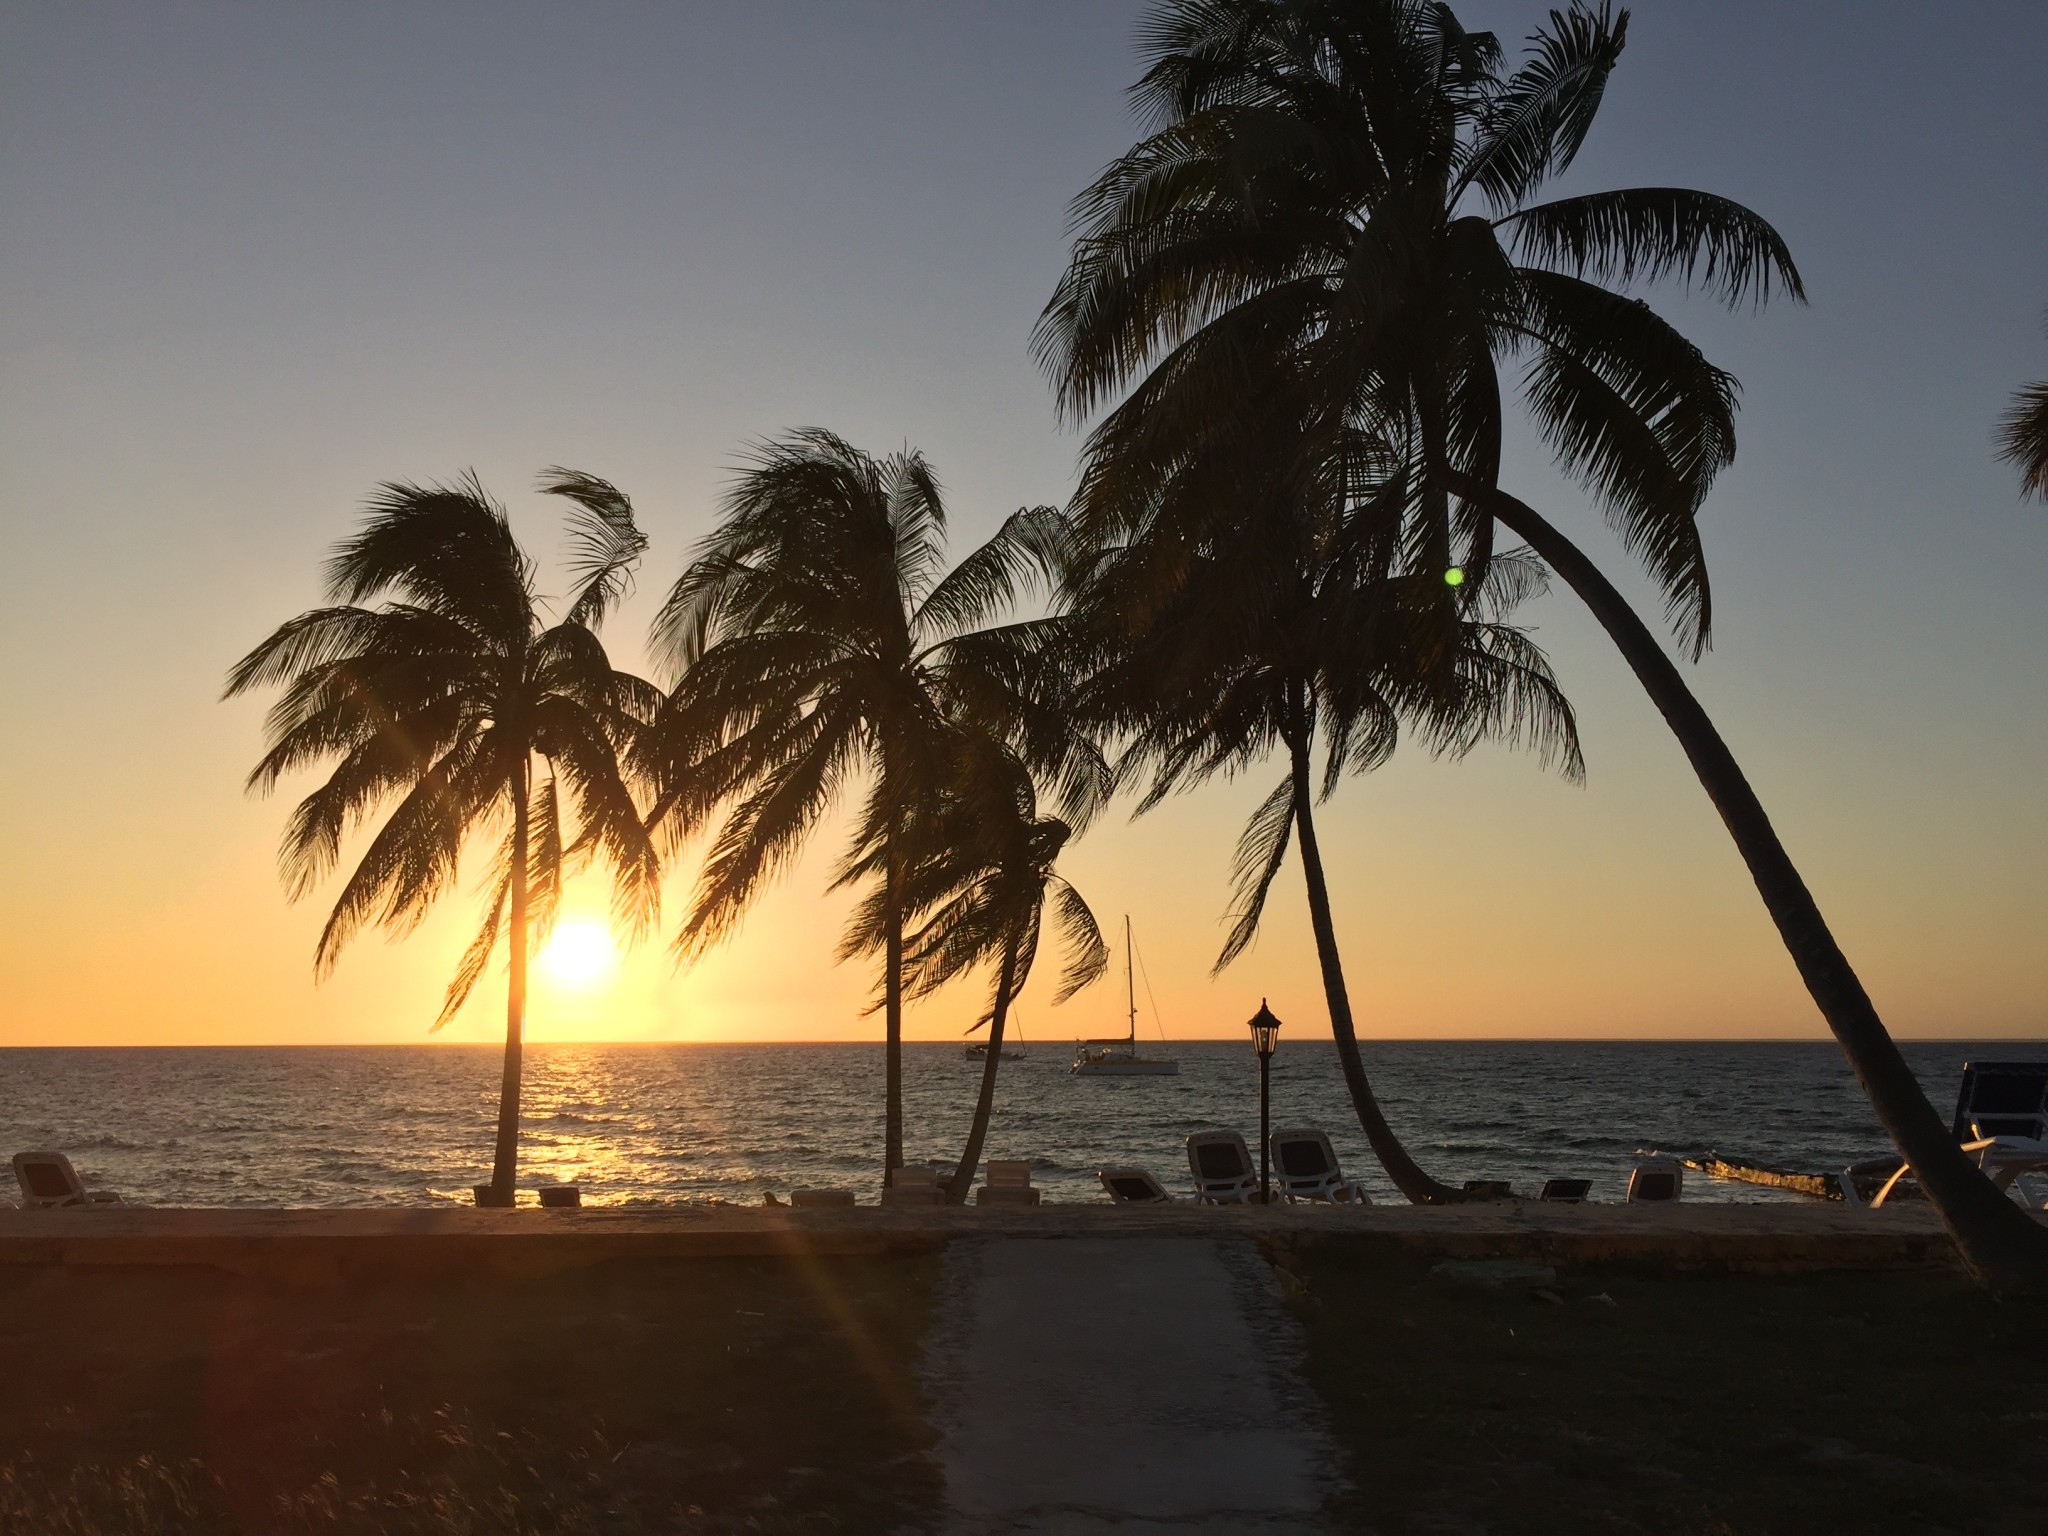 Kuba-Palmen-am-Strand-Sonnenuntergang-im-Meer